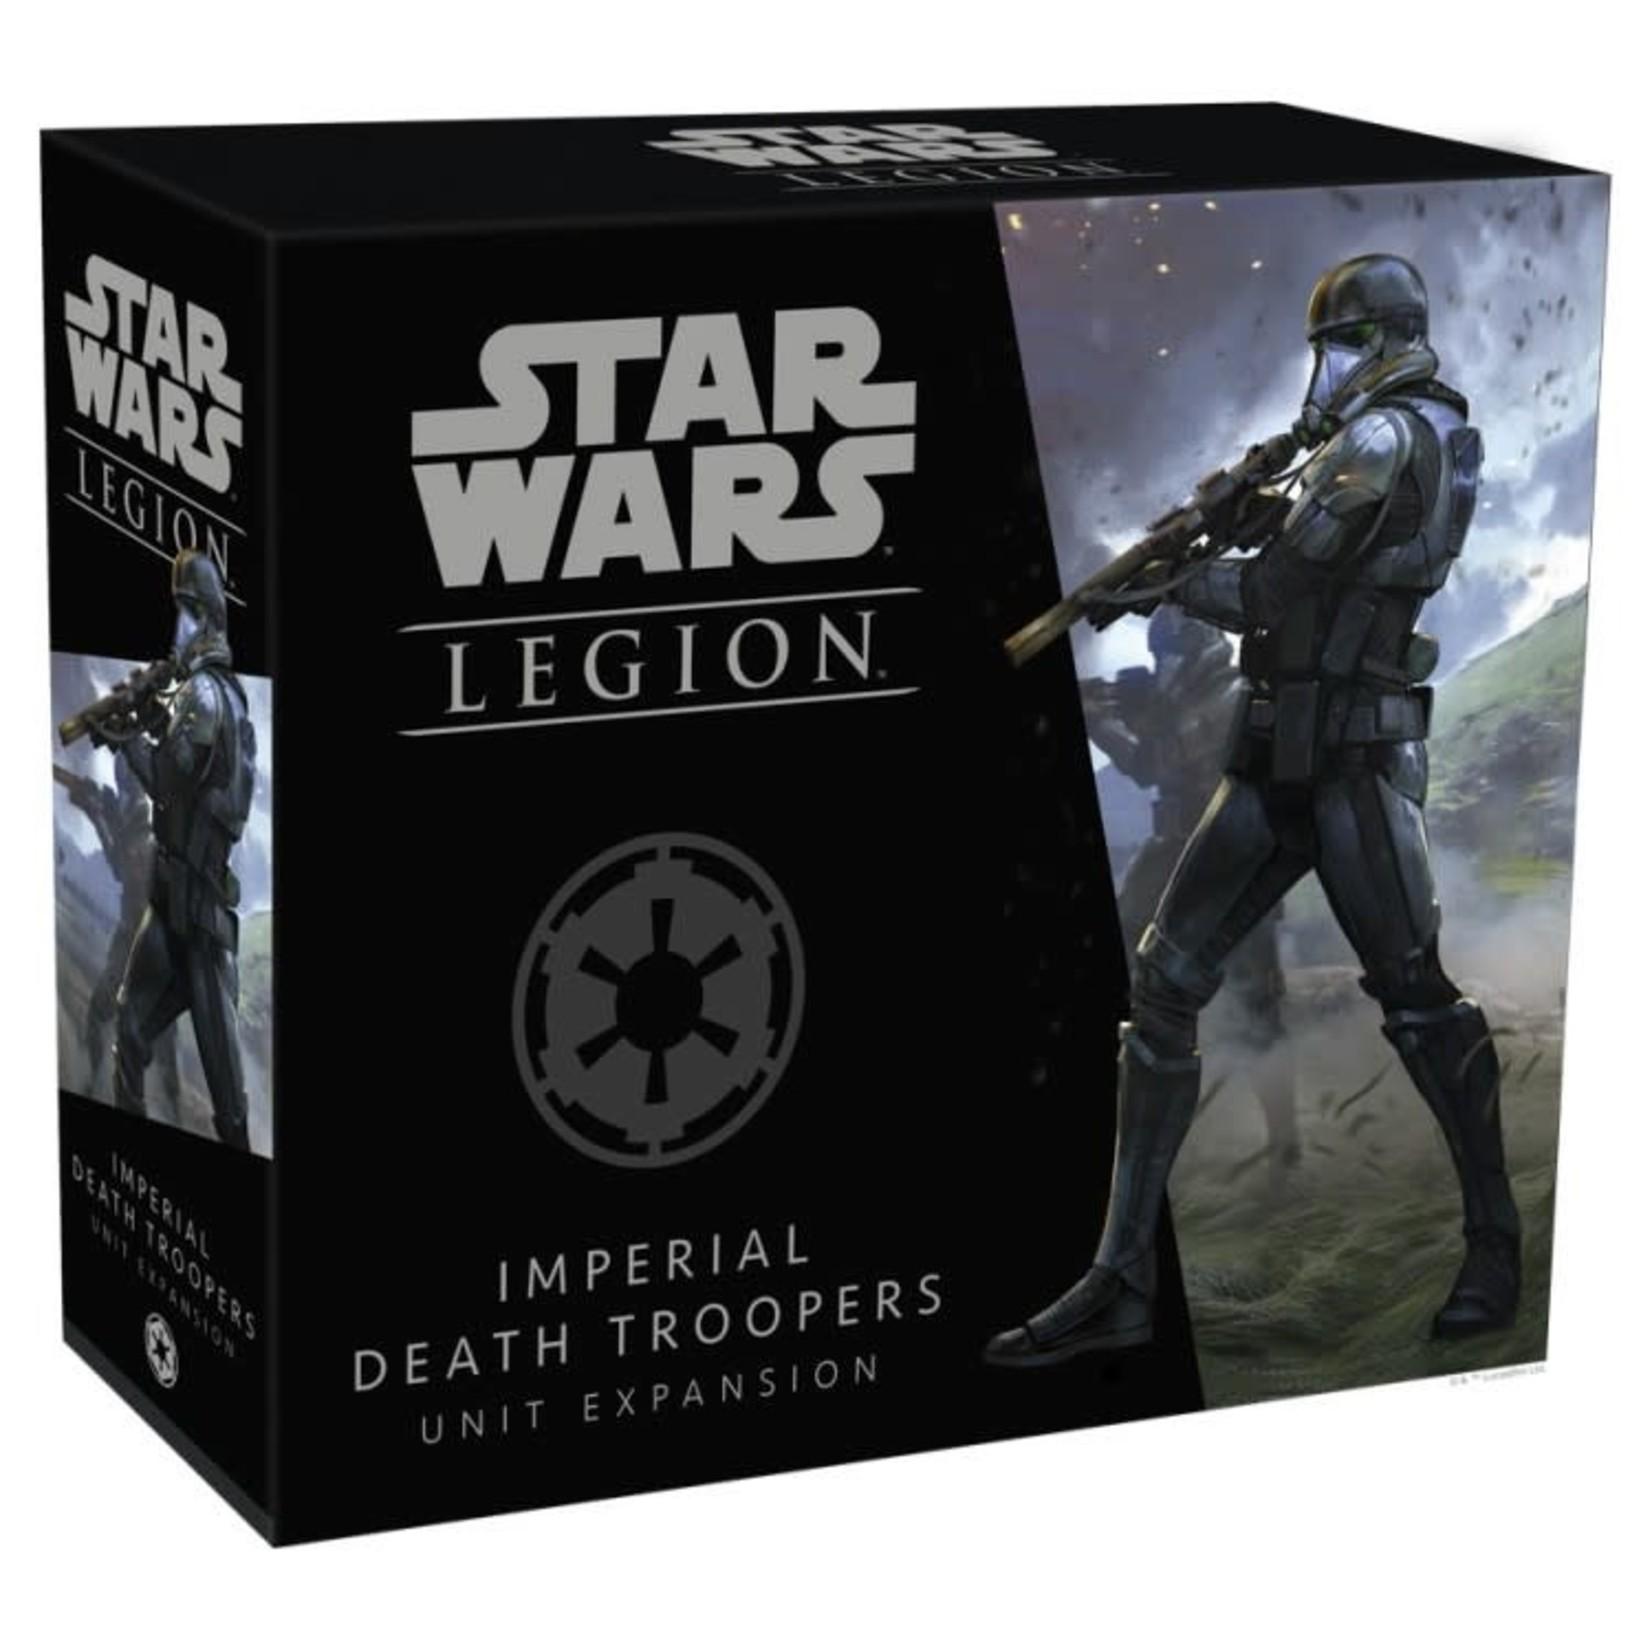 Fantasy Flight Games Star Wars: Legion - Imperial Death Troopers Expansion